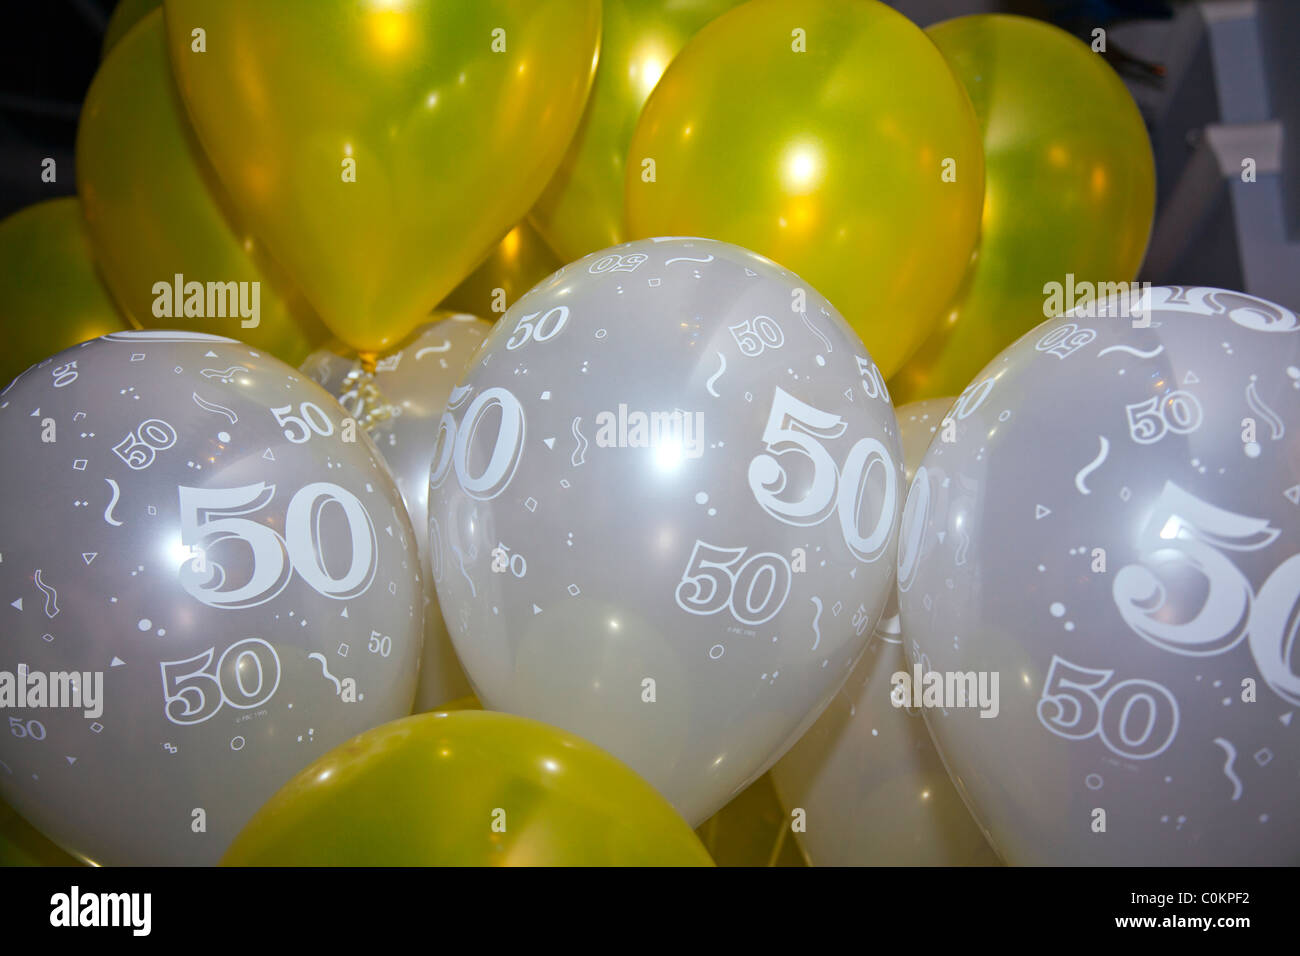 50 Geburtstag Luftballons Feier Dekoration Stockfoto Bild